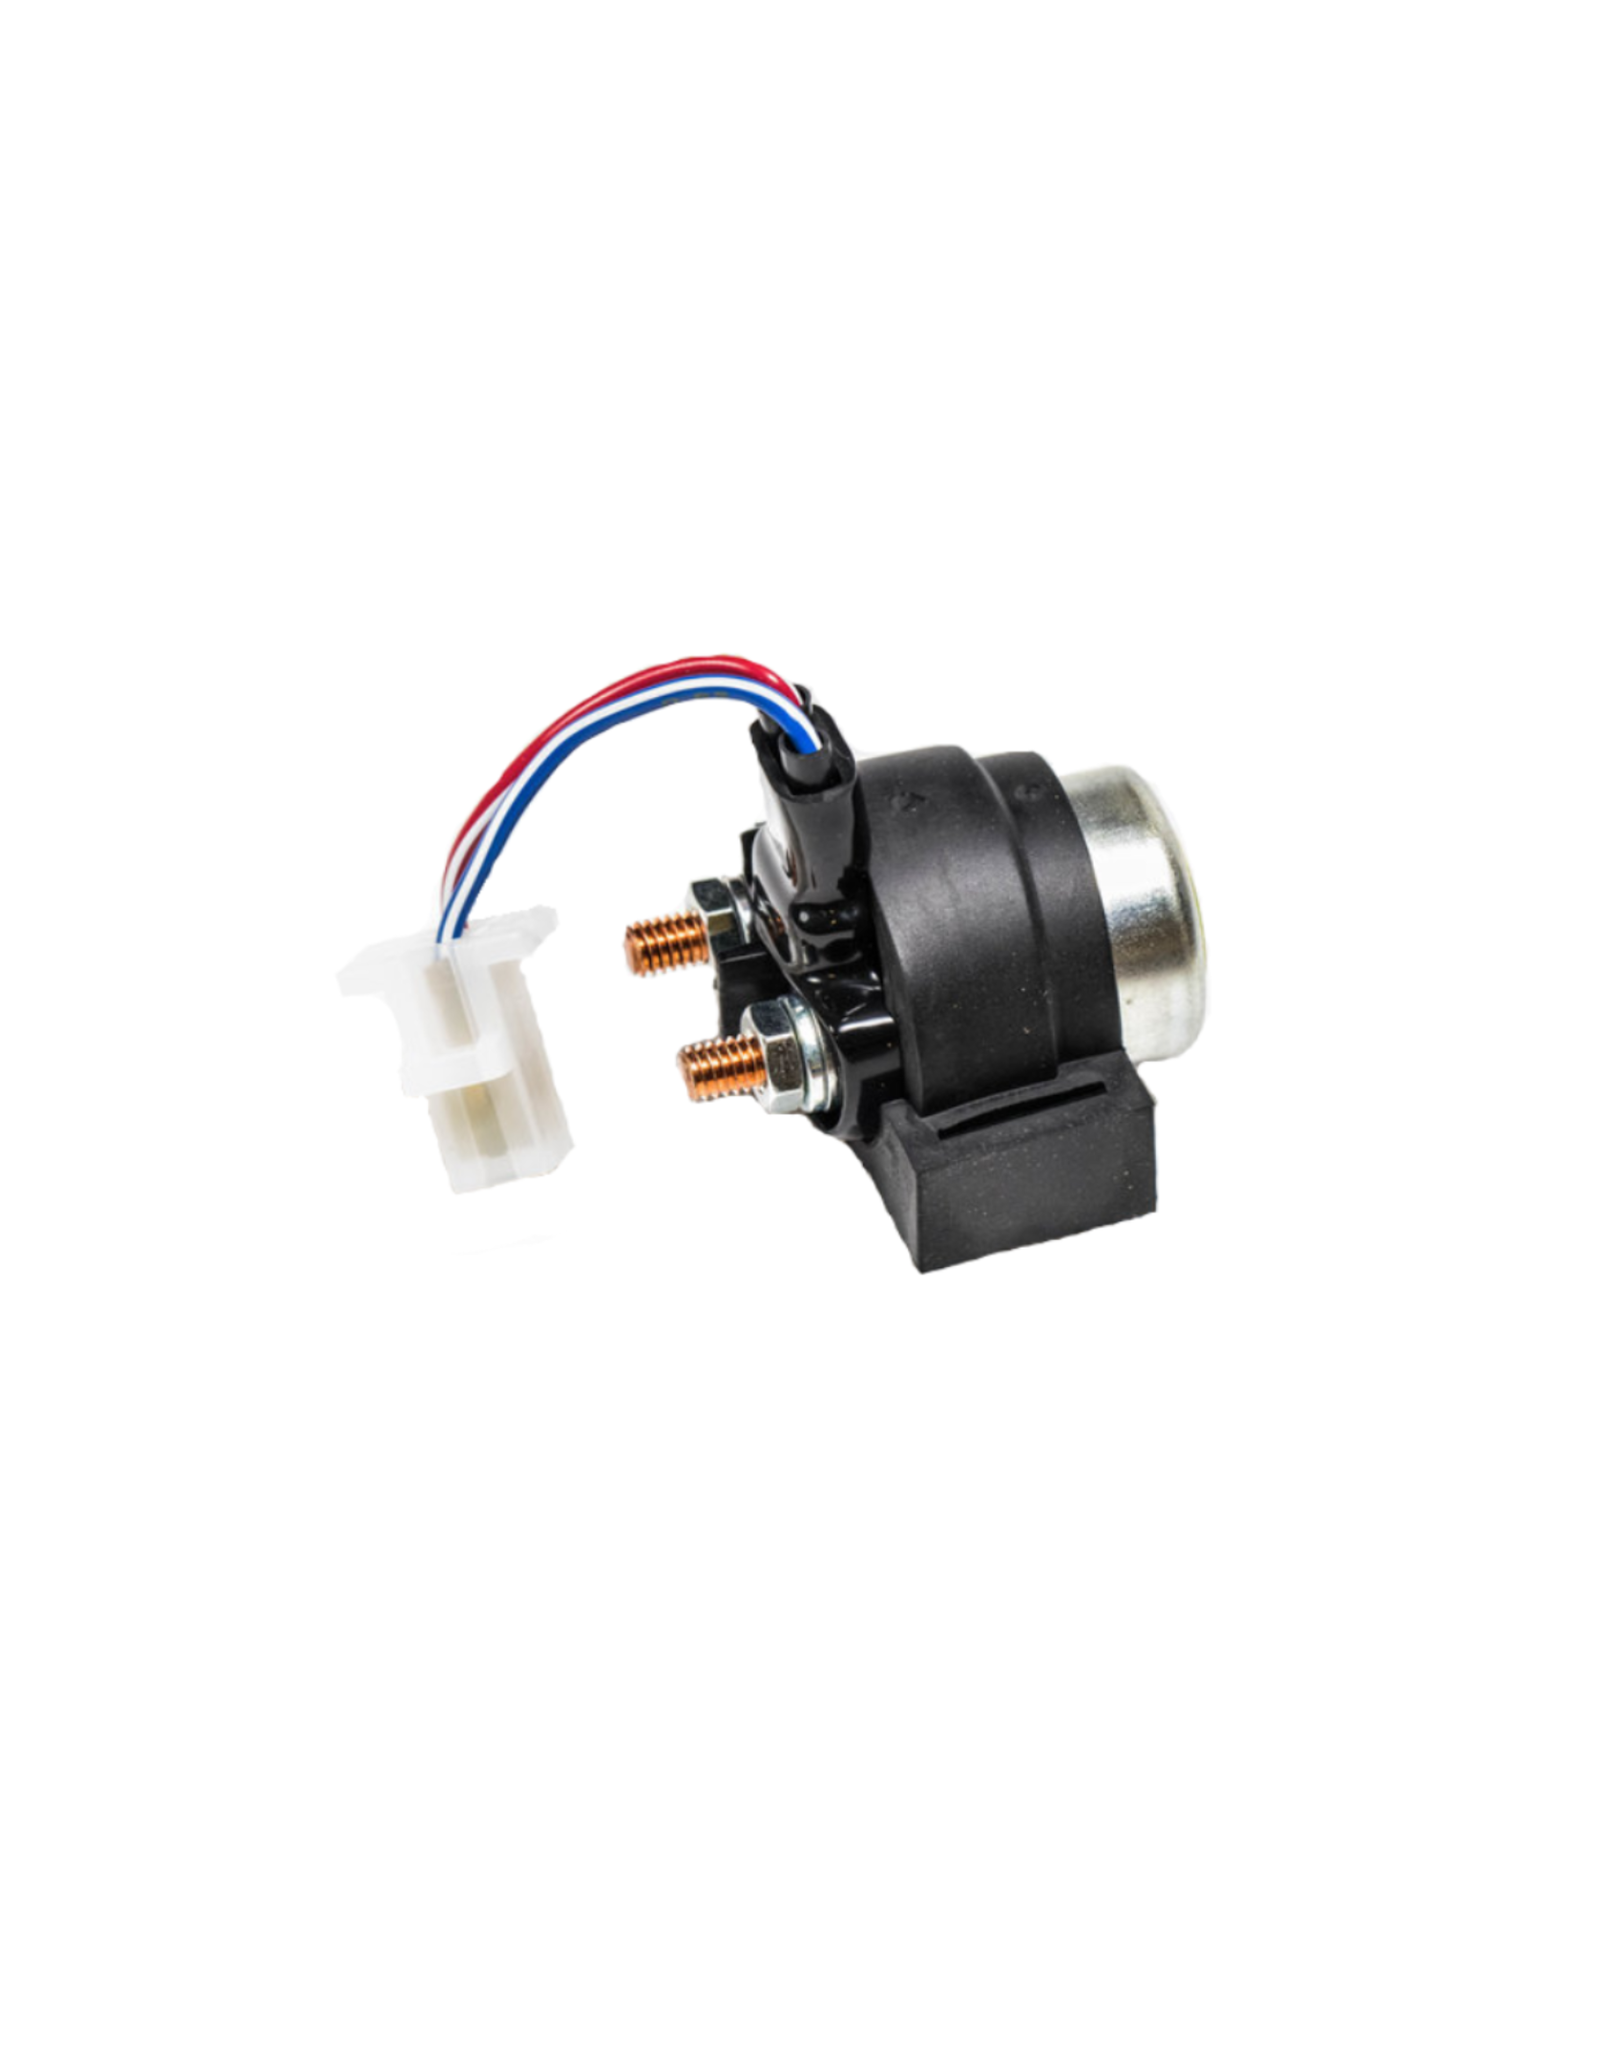 Aprilia Starter Solenoid Upgrade 150 amp (RSV/Tuono >06) AP81129275